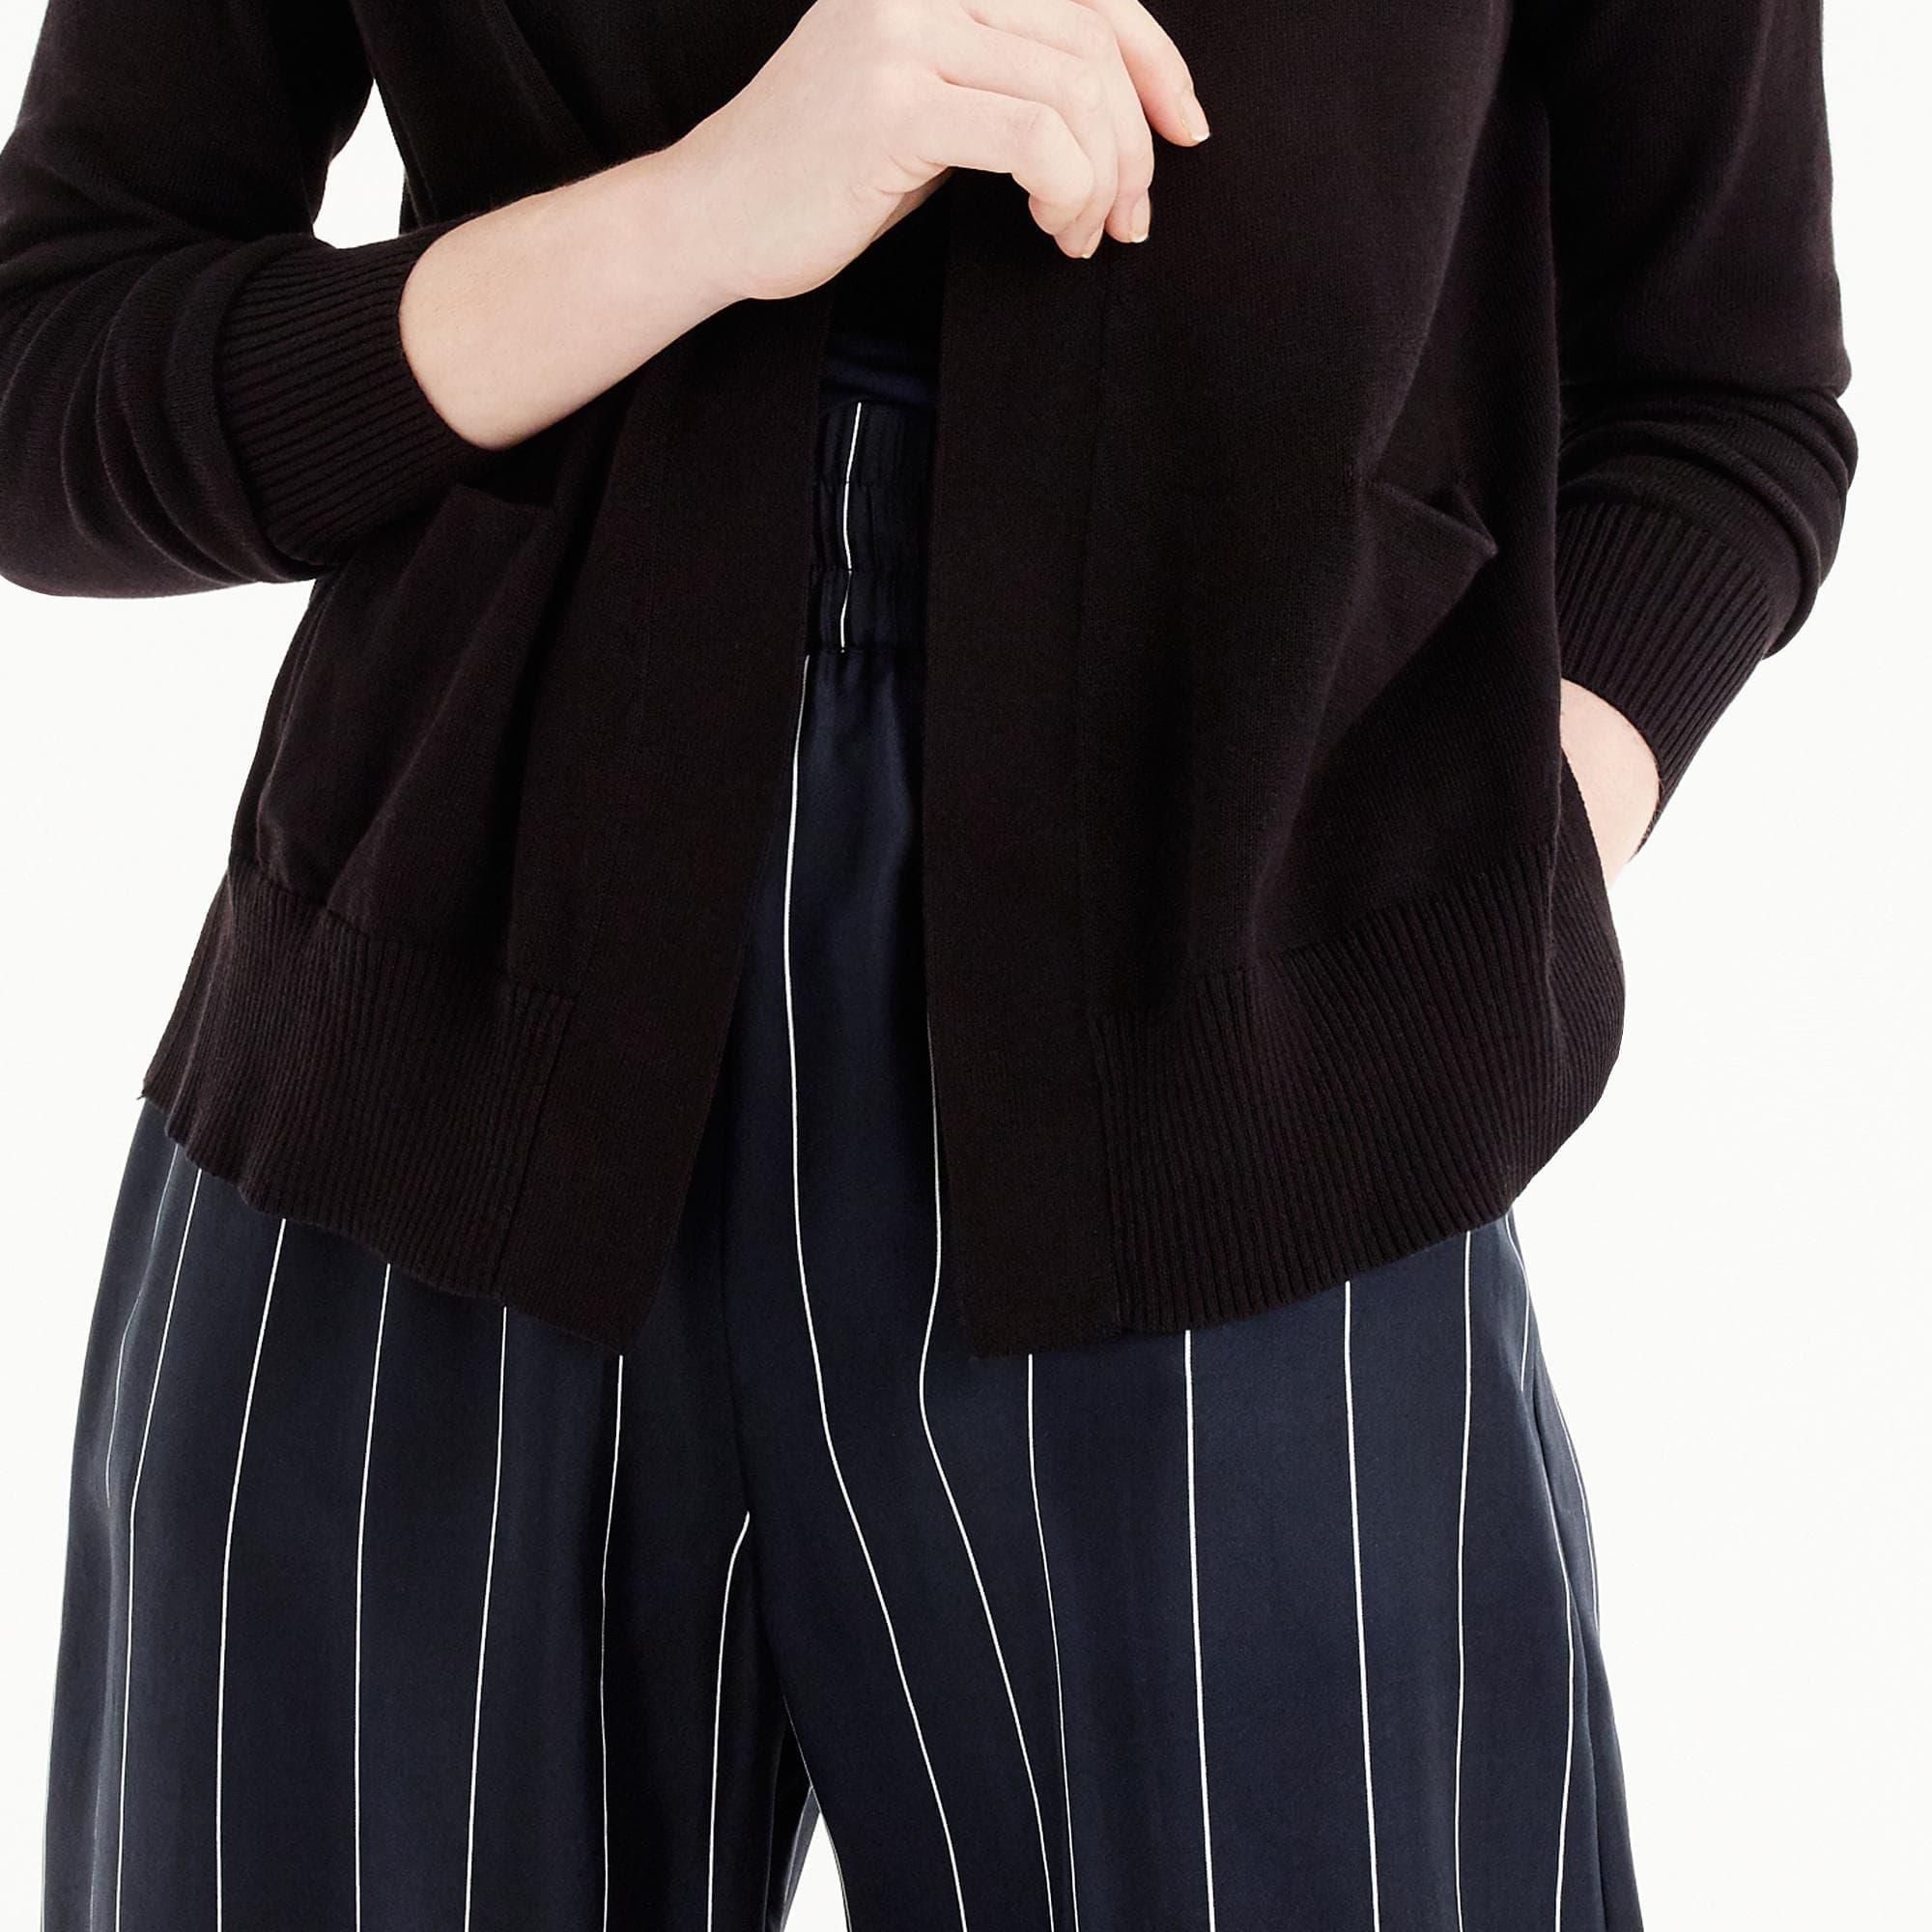 J.crew Open-front Cardigan Sweater in Black | Lyst